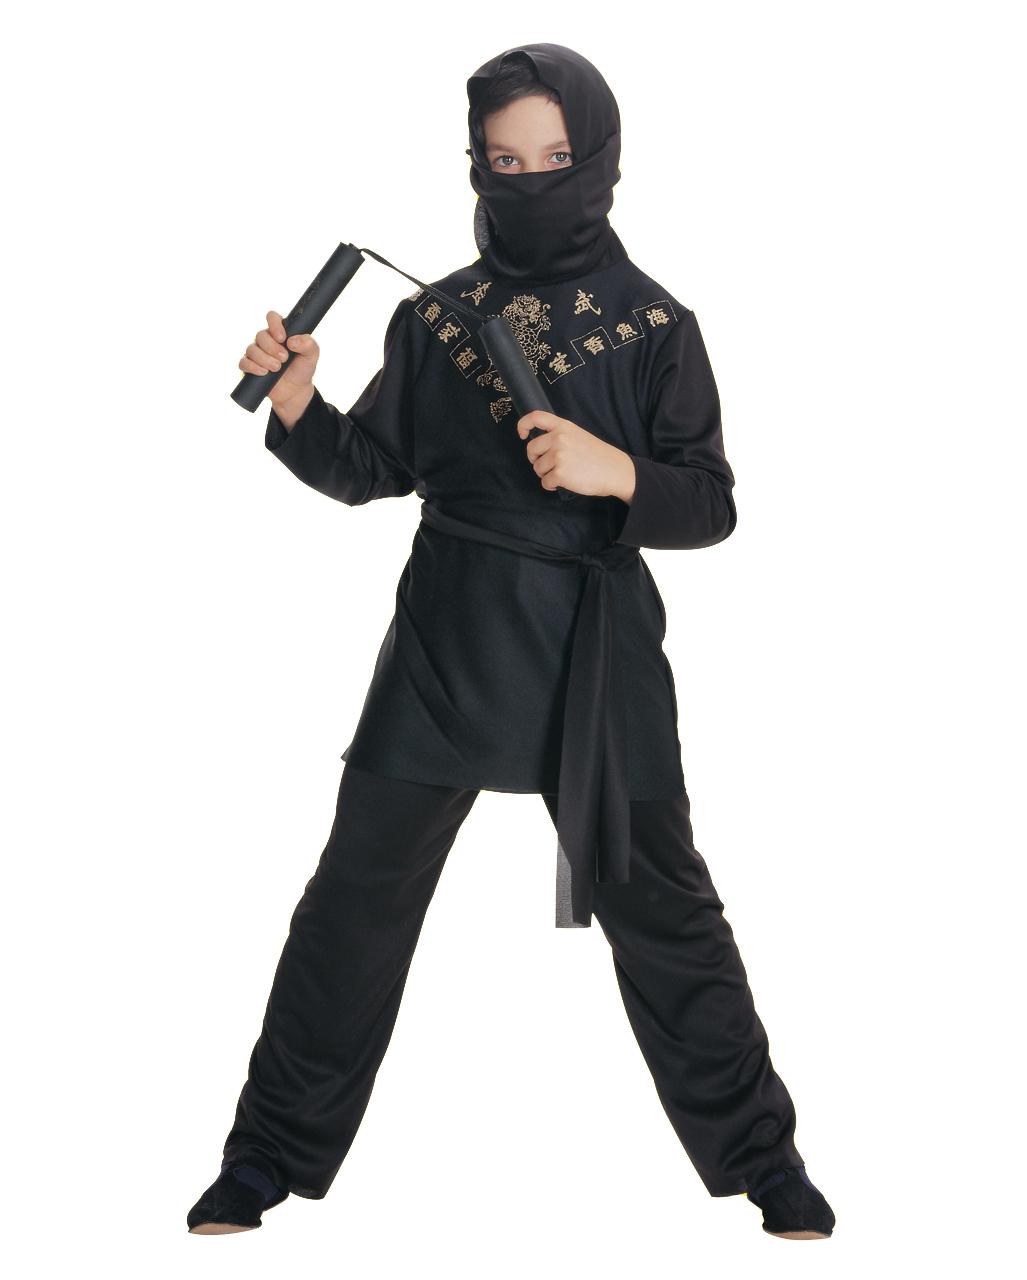 Ninja Kinder Kostum Fur Halloween Fasching Horror Shop Com